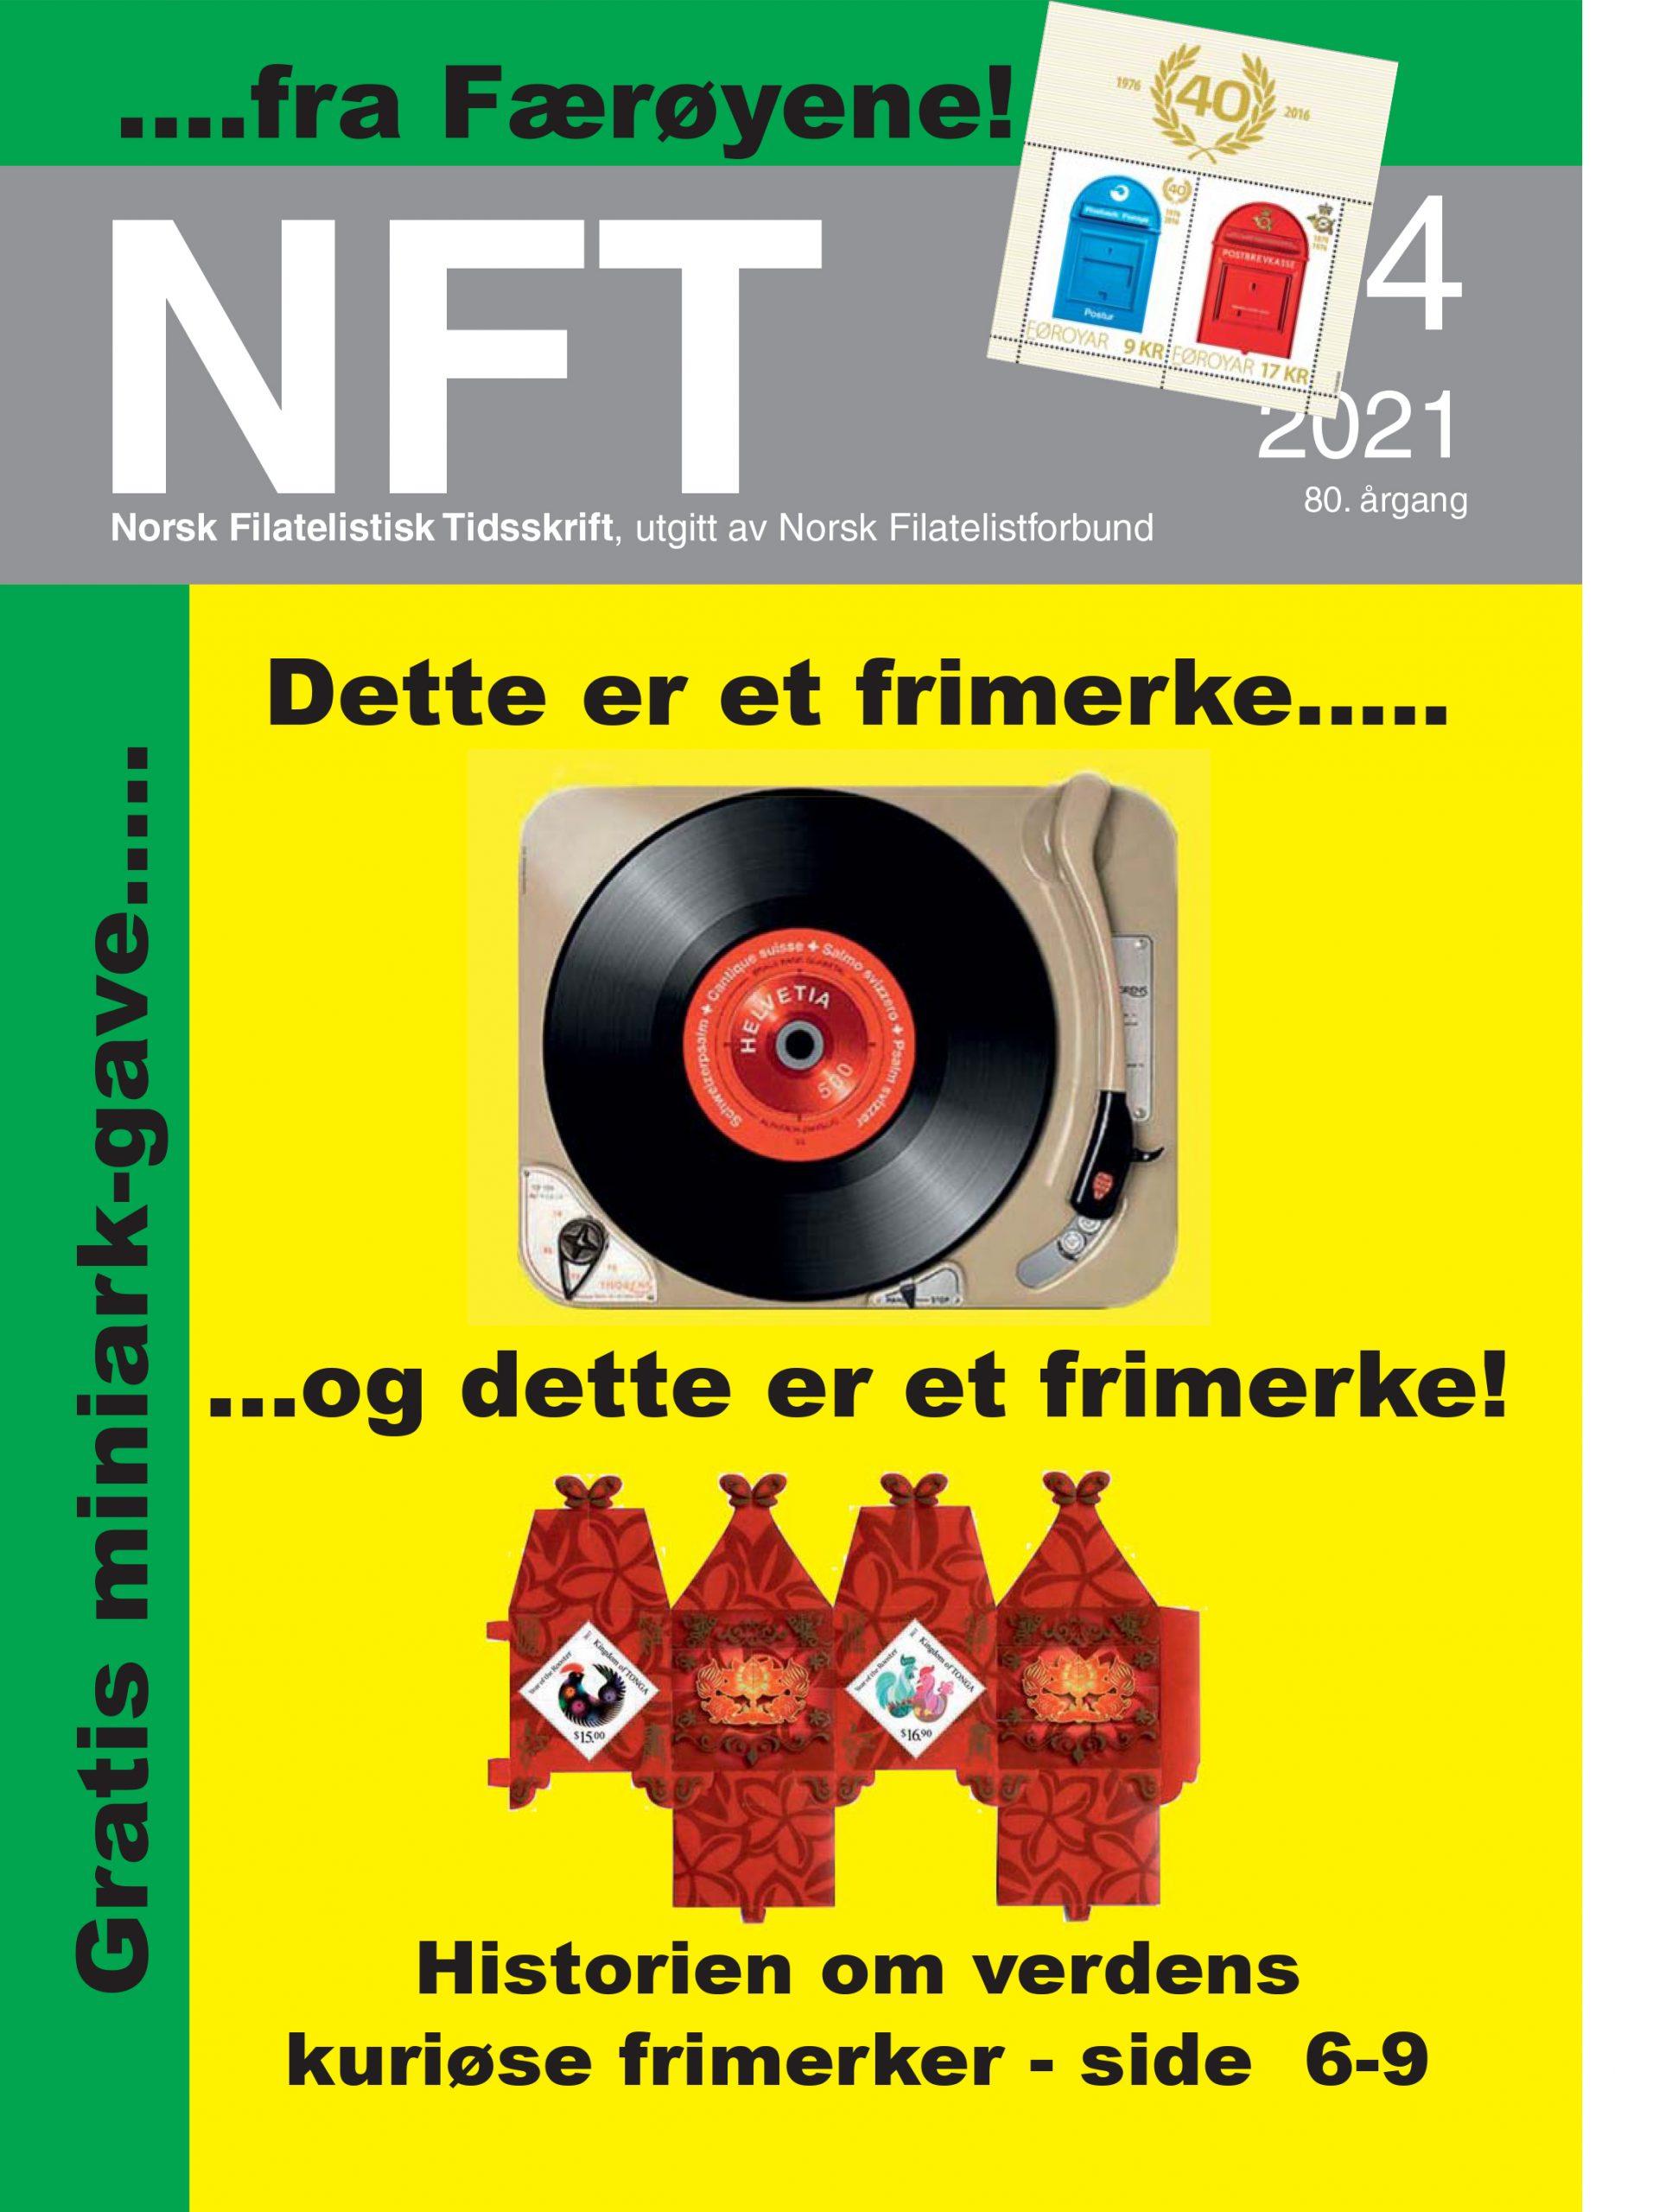 NFT nr 4/2021